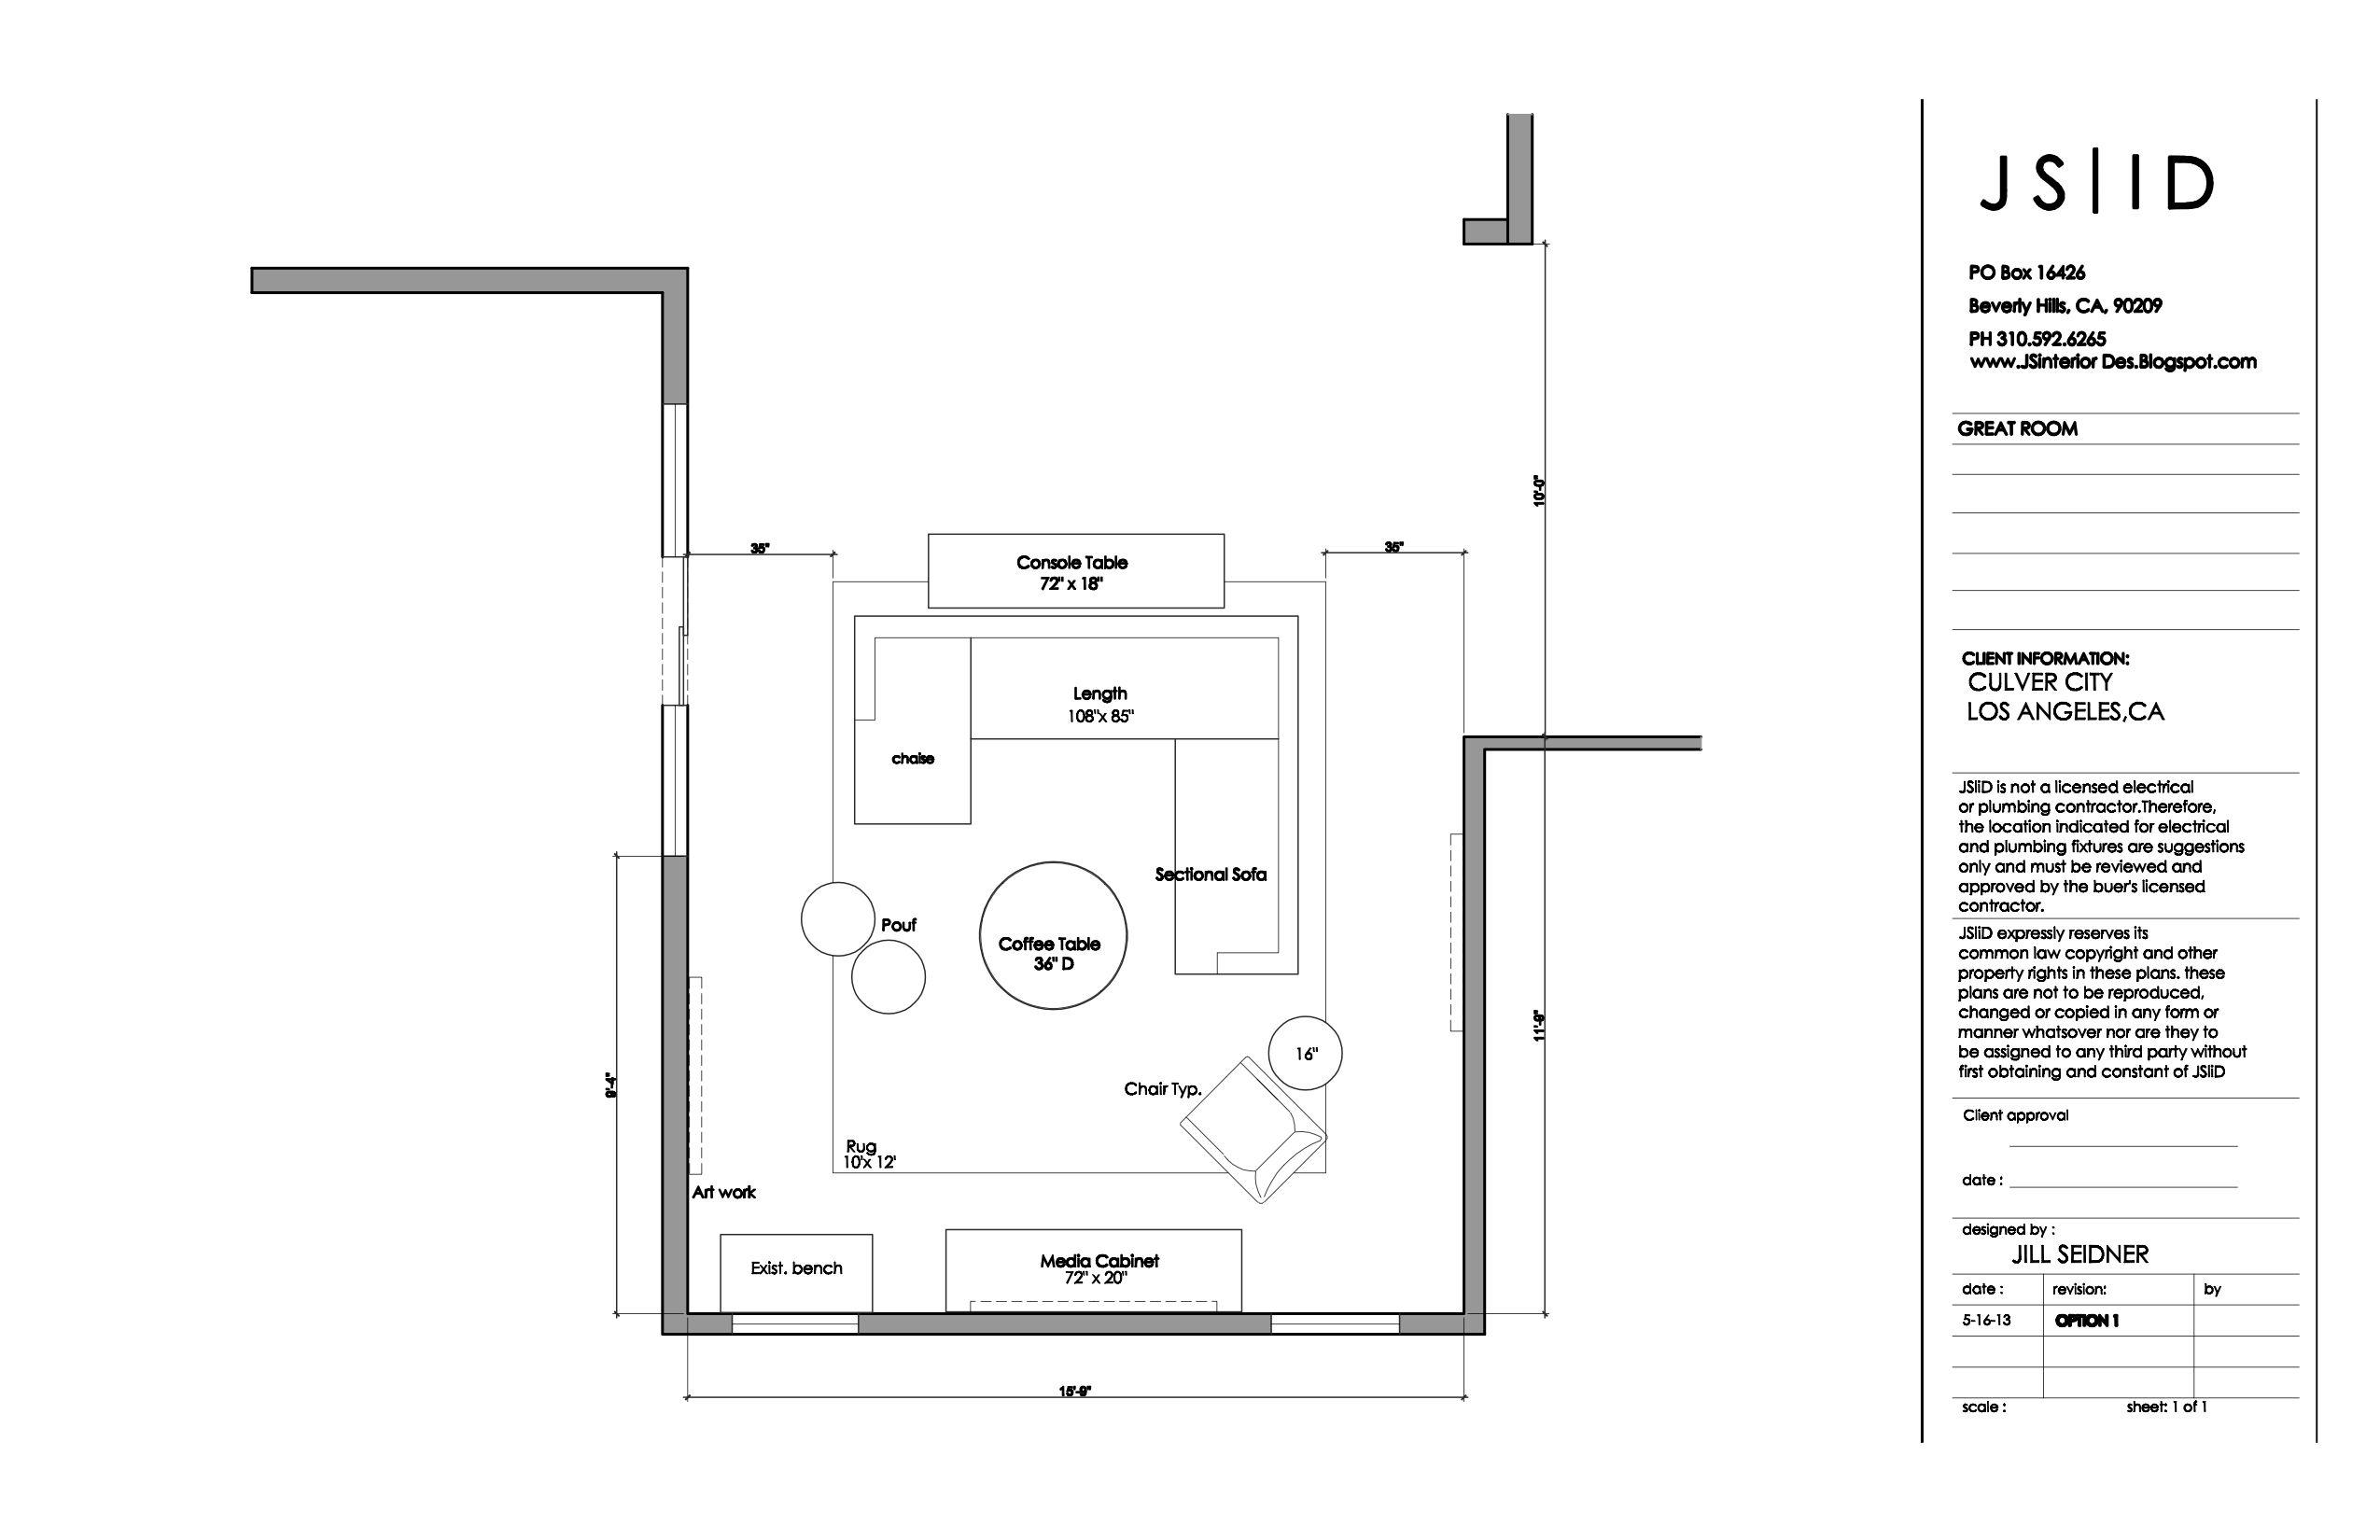 Culver City CA Residence Great Room Furniture Floor Plan